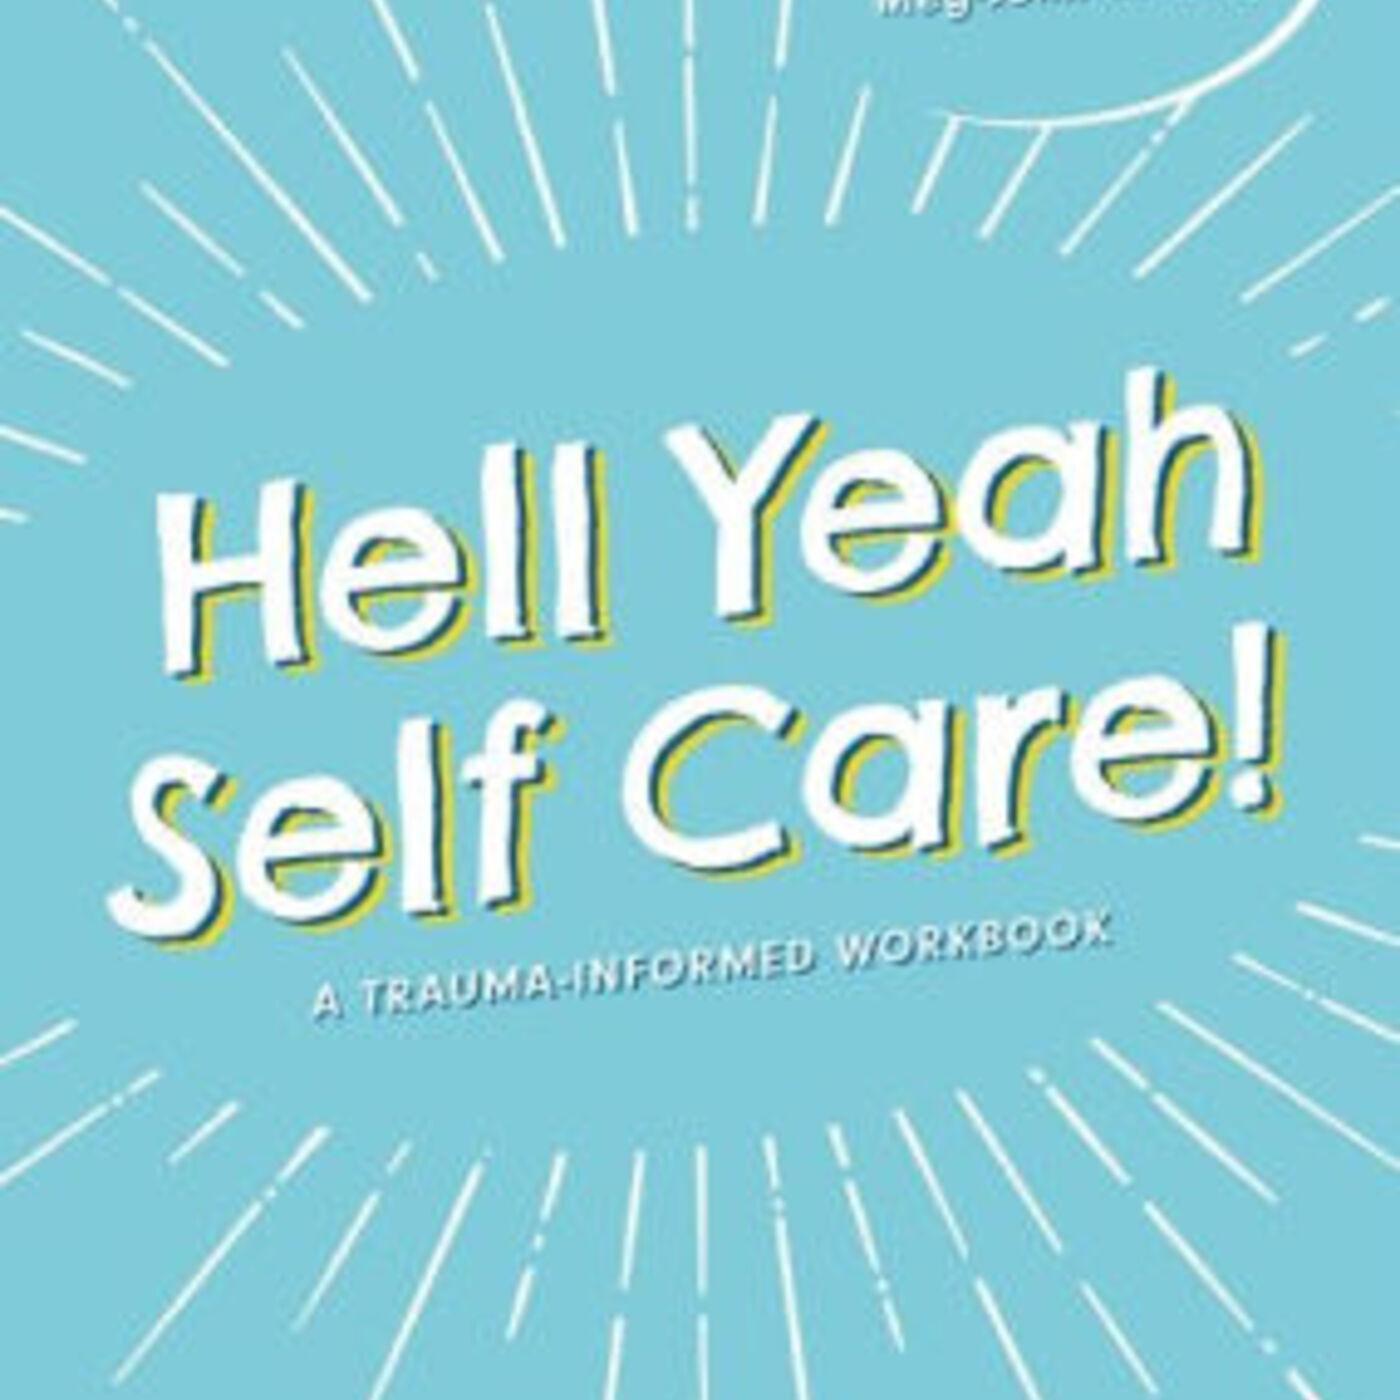 Hell Yeah Self Care! A dialogue between Meg-John Barker and Alex Iantaffi